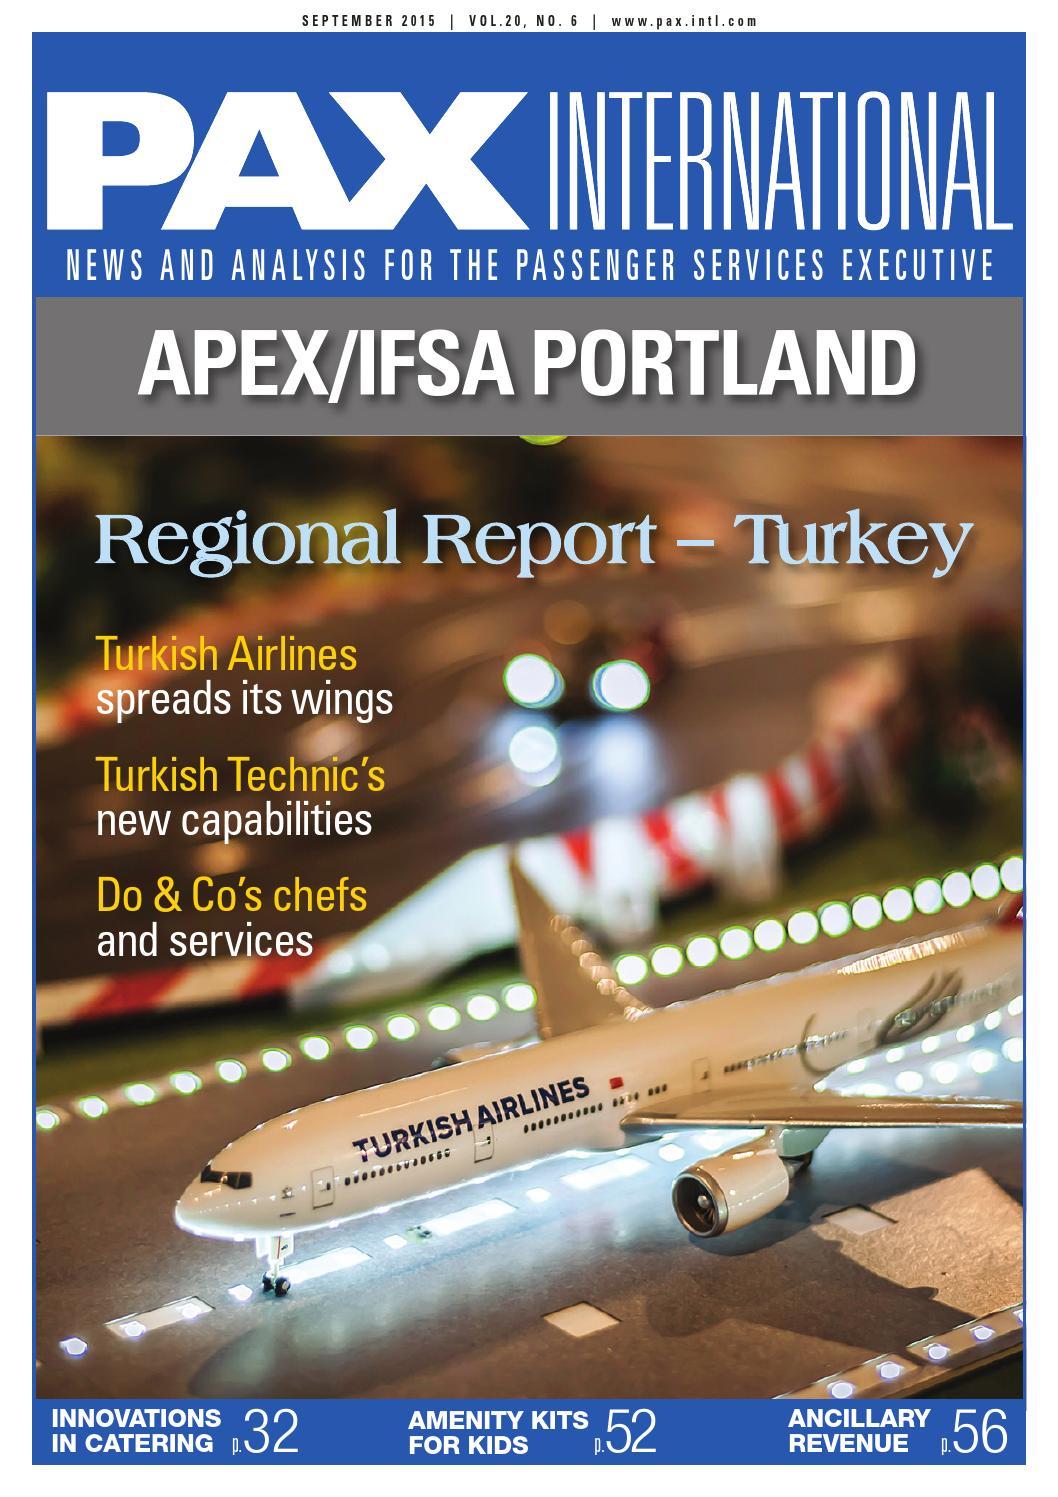 PAX APEX/IFSA Portland September 2015 by Global Marketing